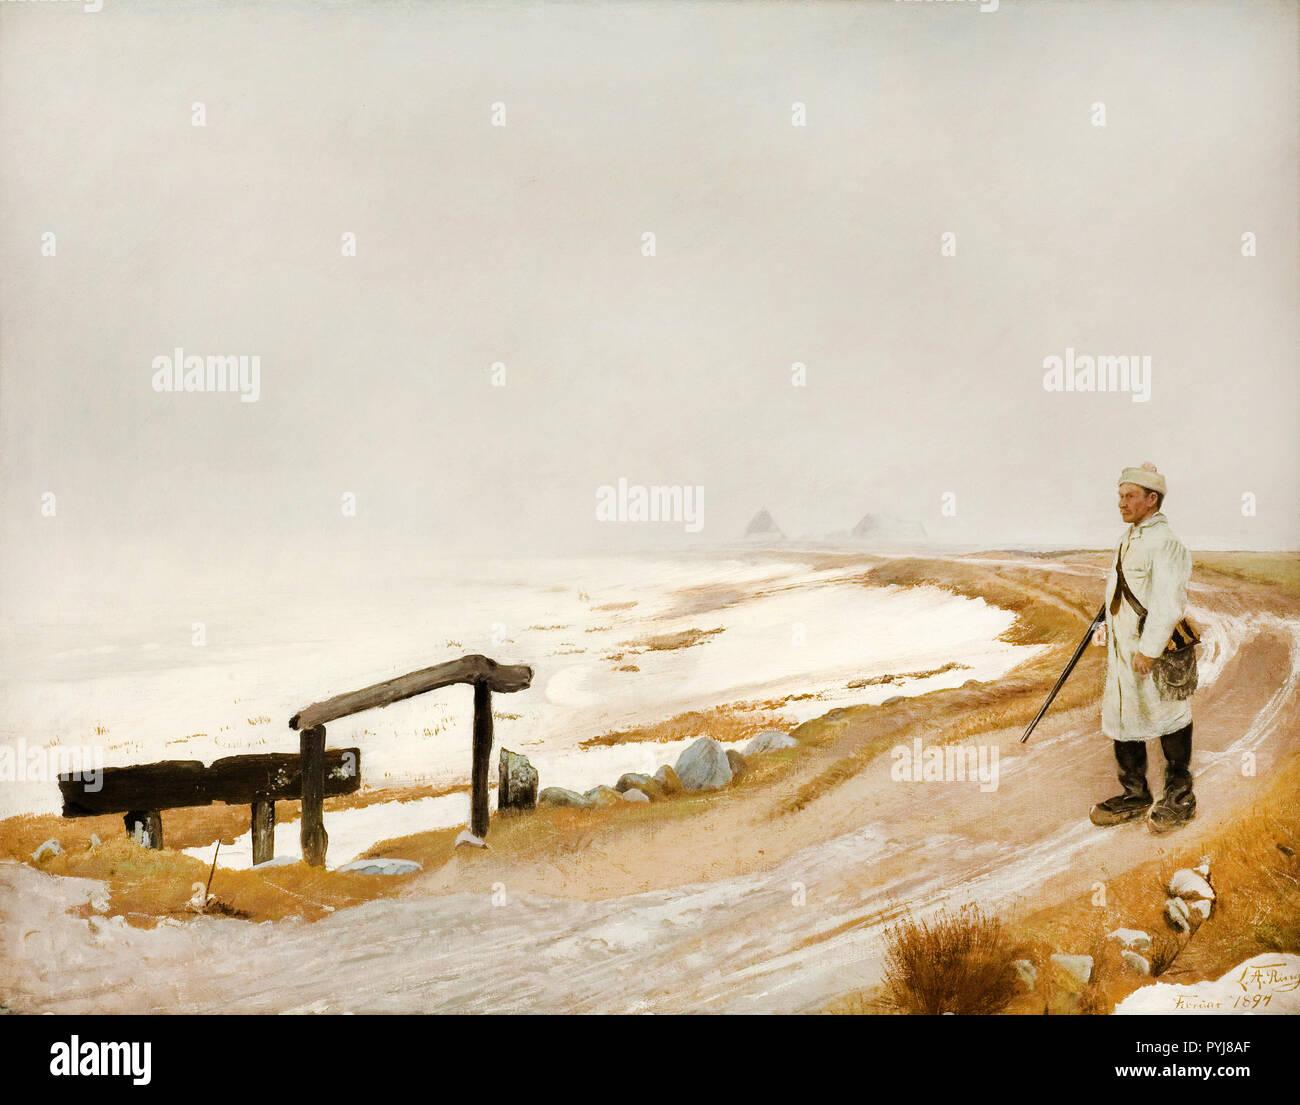 Laurits Andersen Ring, Foggy Winter's Day, Karrebaeksminde 1897 Oil on canvas, The Hirschsprung Collection, Copenhagen, Denmark. - Stock Image